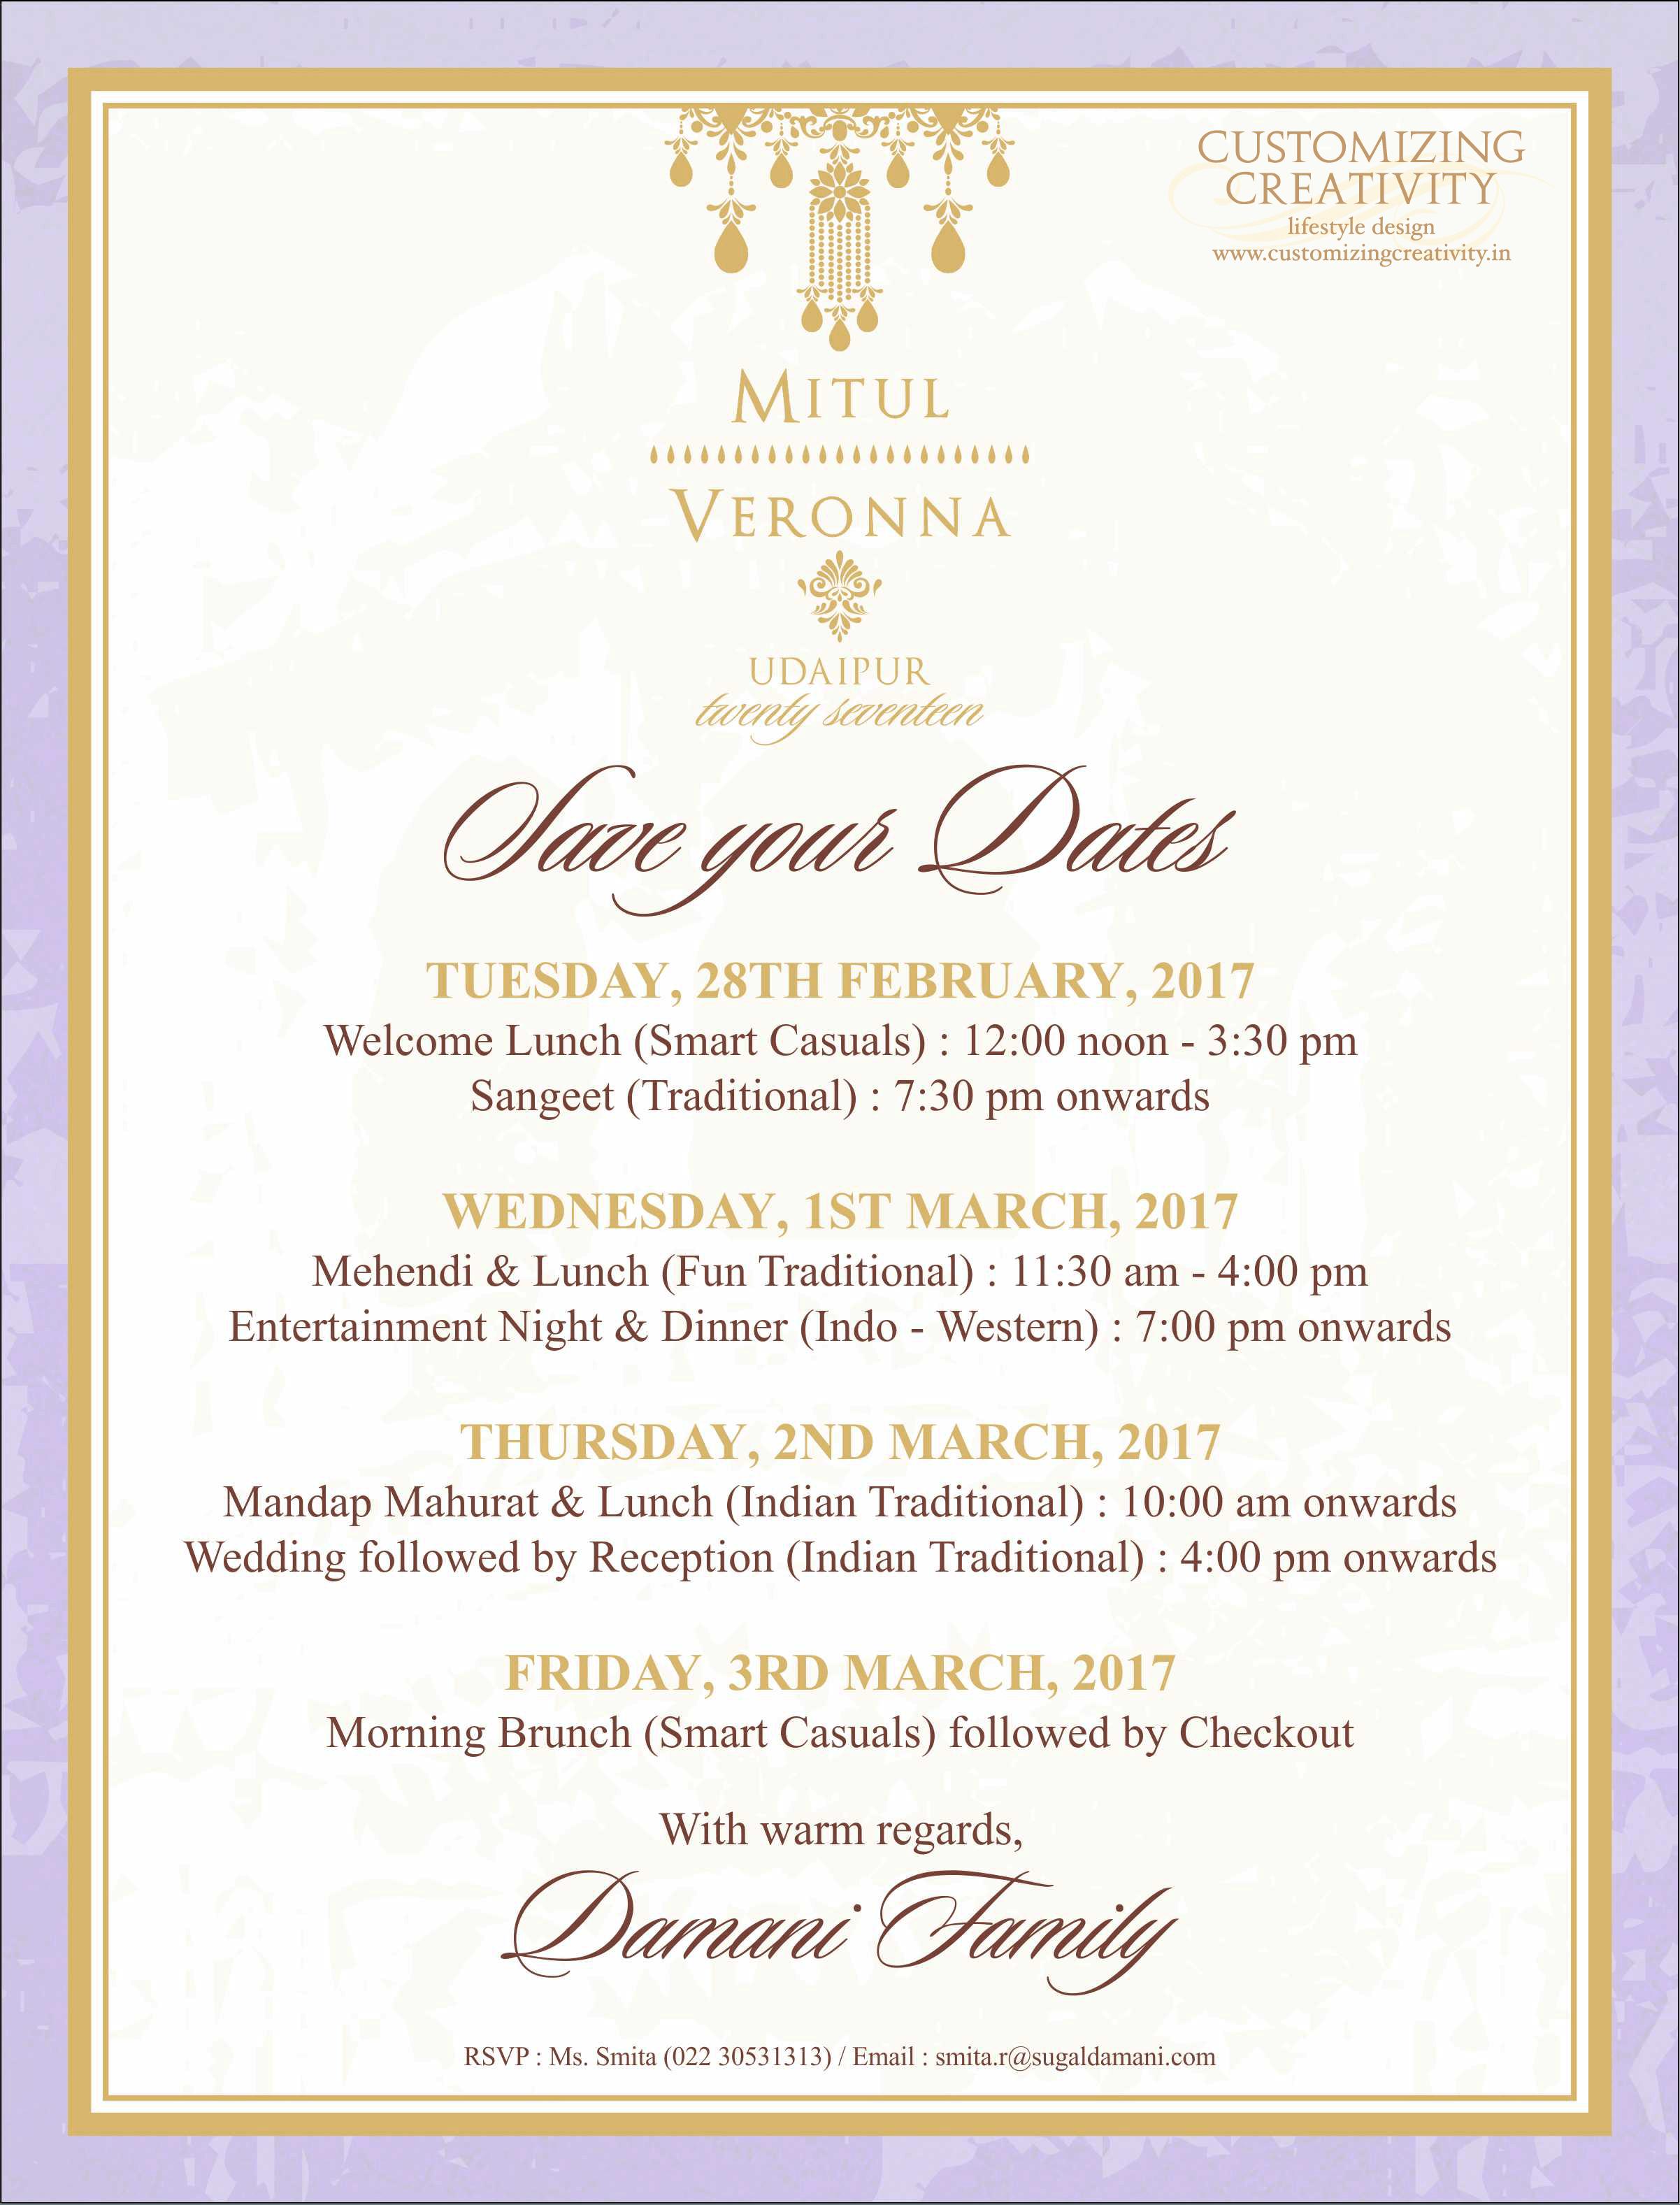 Wedding Invitation Cards Indian Wedding Cards Invites Wedding Stationery E Invite Wedding Invitations Stationery Wedding Invitations Simple Wedding Cards